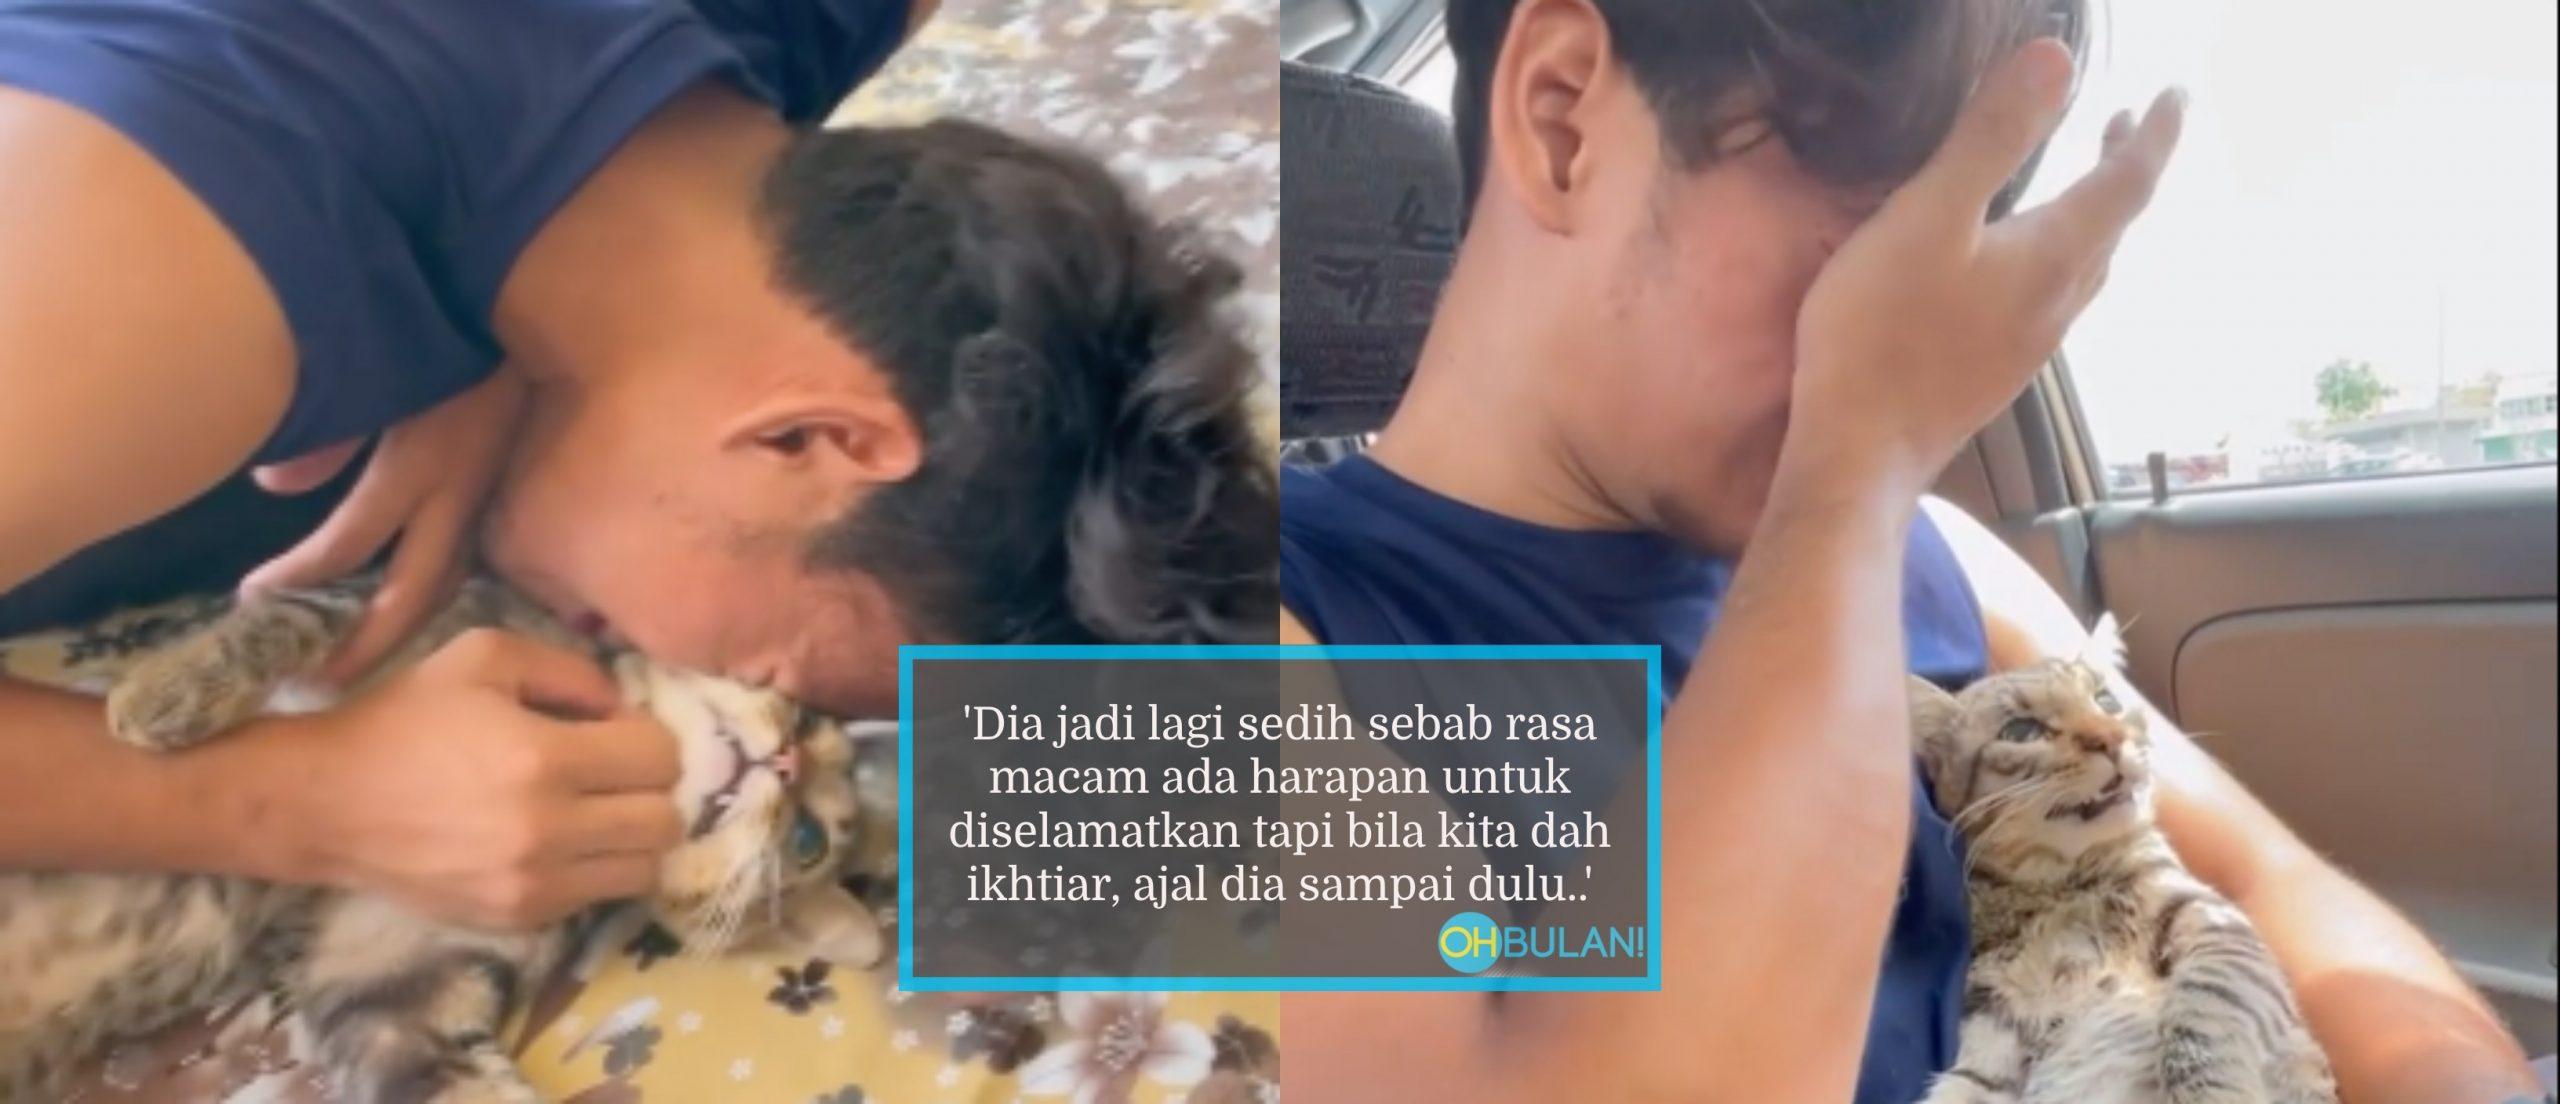 Viral Video Menangis Kucing Mati, Rupanya 'Paktam' Dah Bagi 'Hint', Masuk Semua Bilik Buat Kali Terakhir